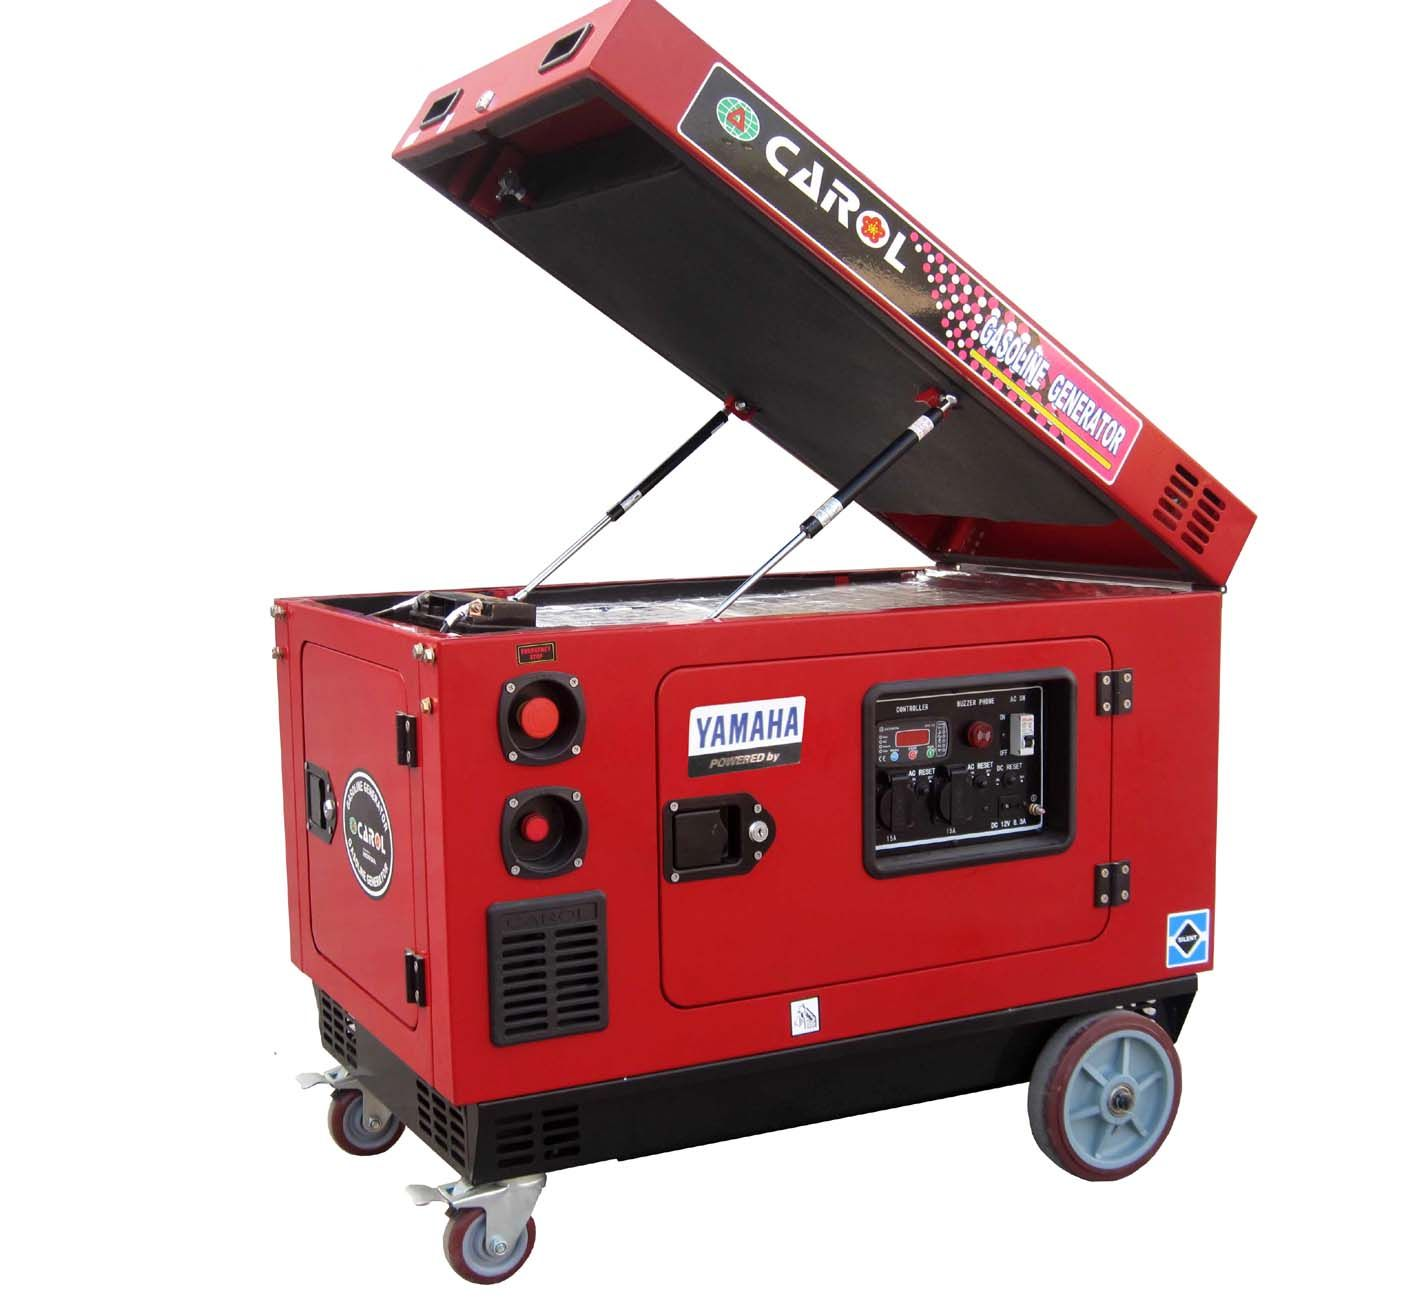 2 8KVA YAMAHA super silent generator 45dB | generator silent